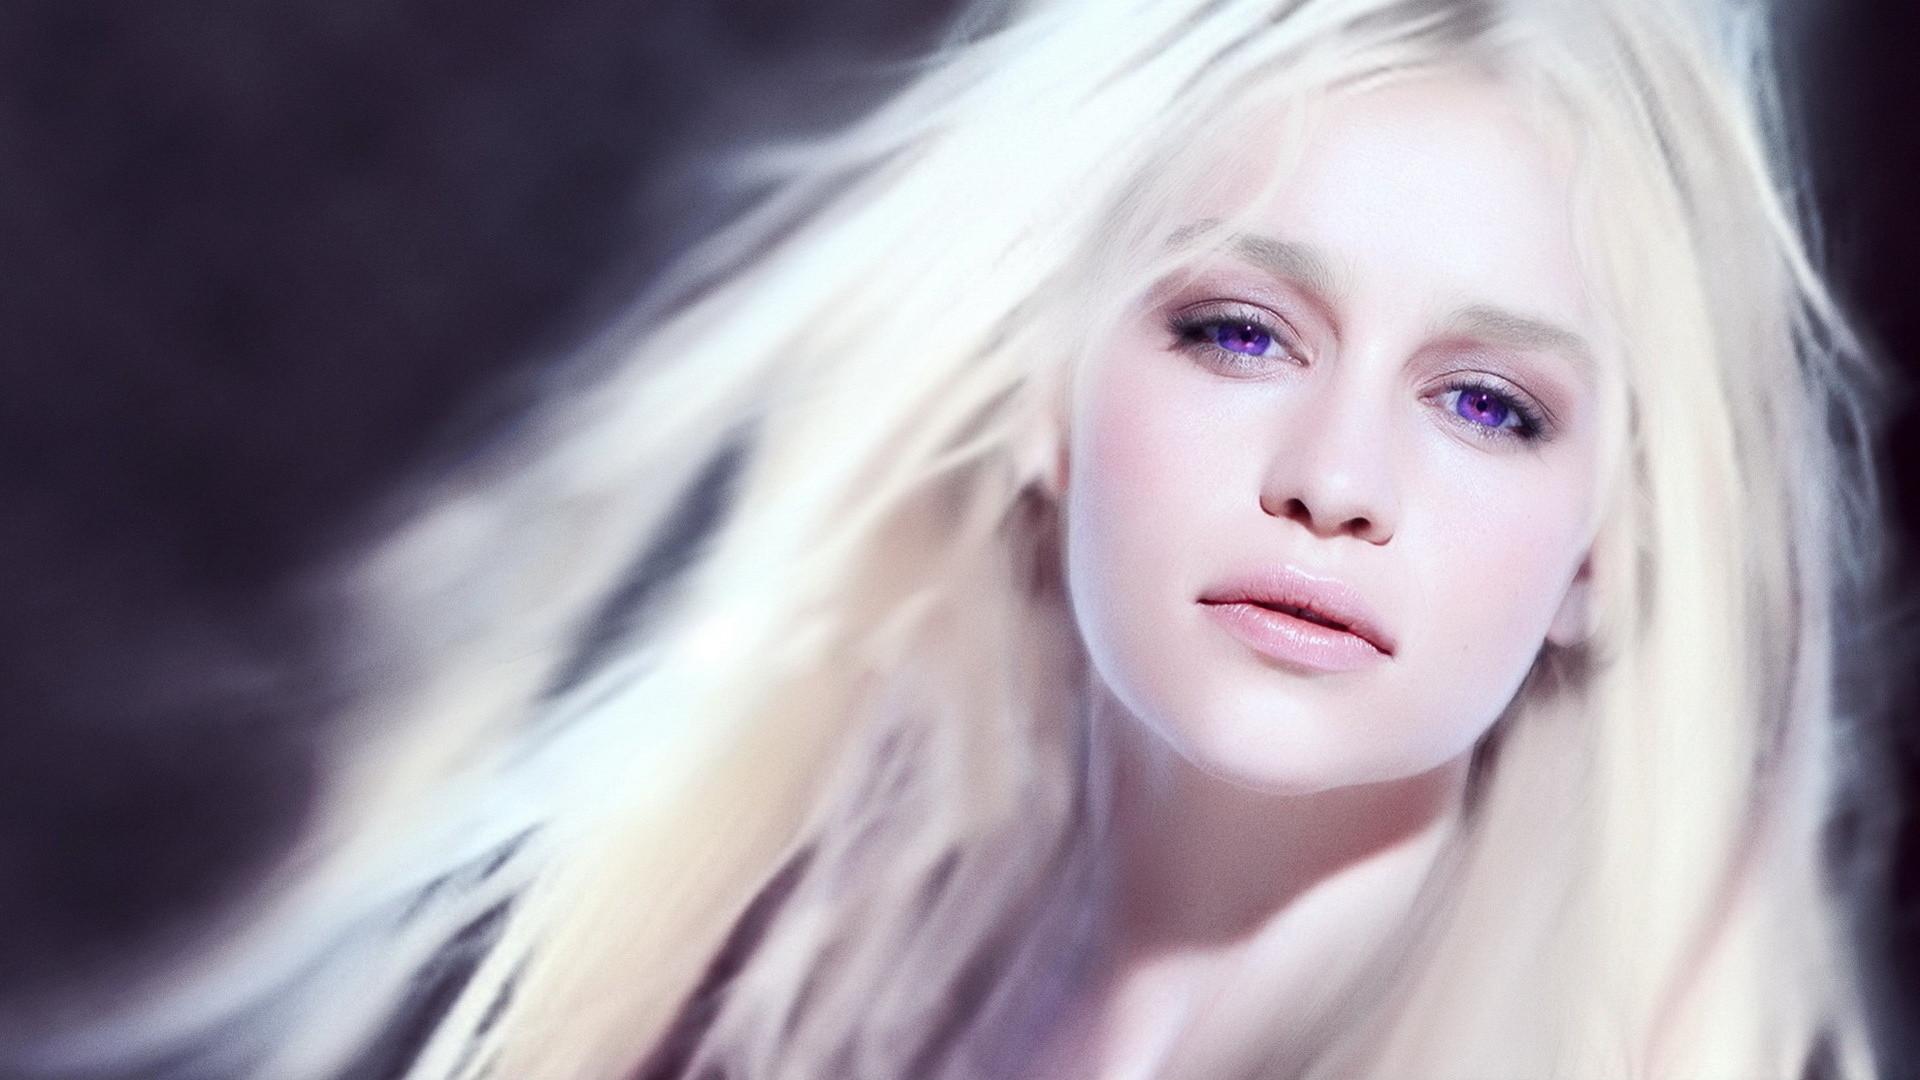 Celebrity – Emilia Clarke Woman Photography Girl Actress Game Of Thrones Daenerys  Targaryen Model Wallpaper